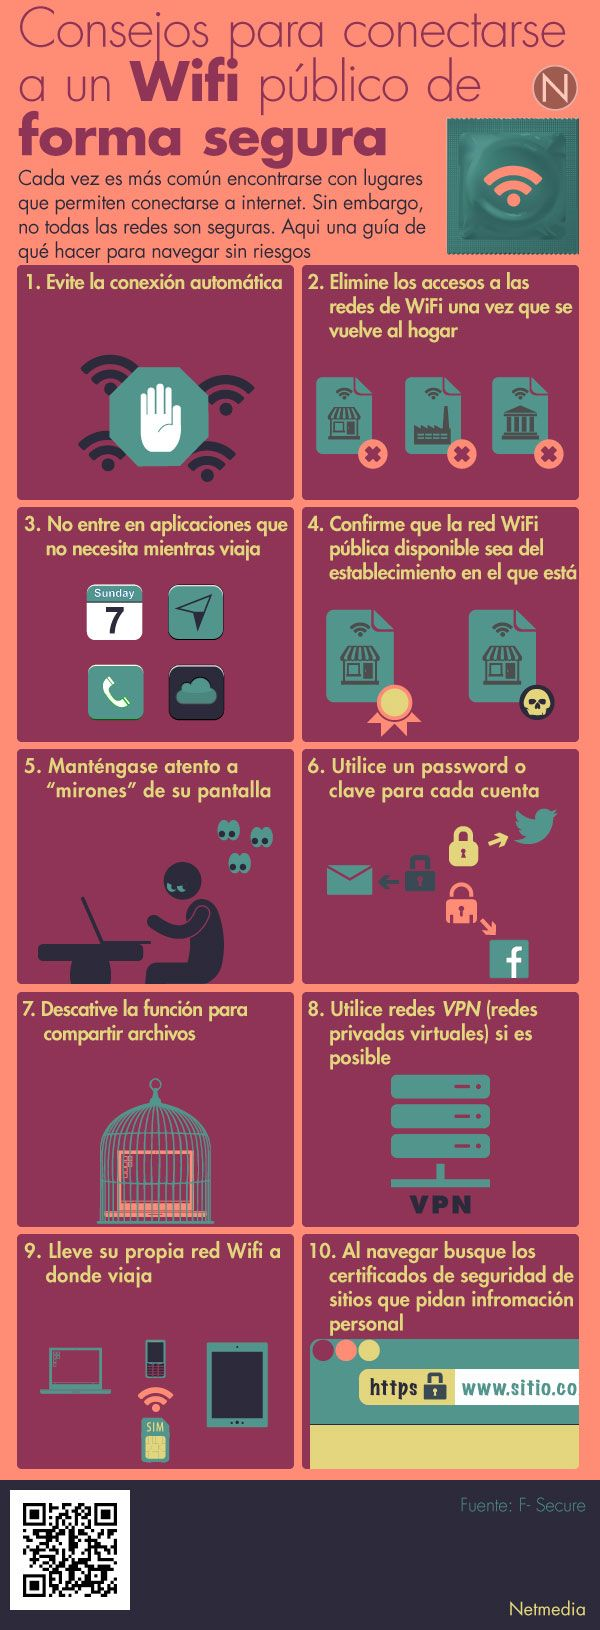 Usa la WiFi pública de forma segura #infografia